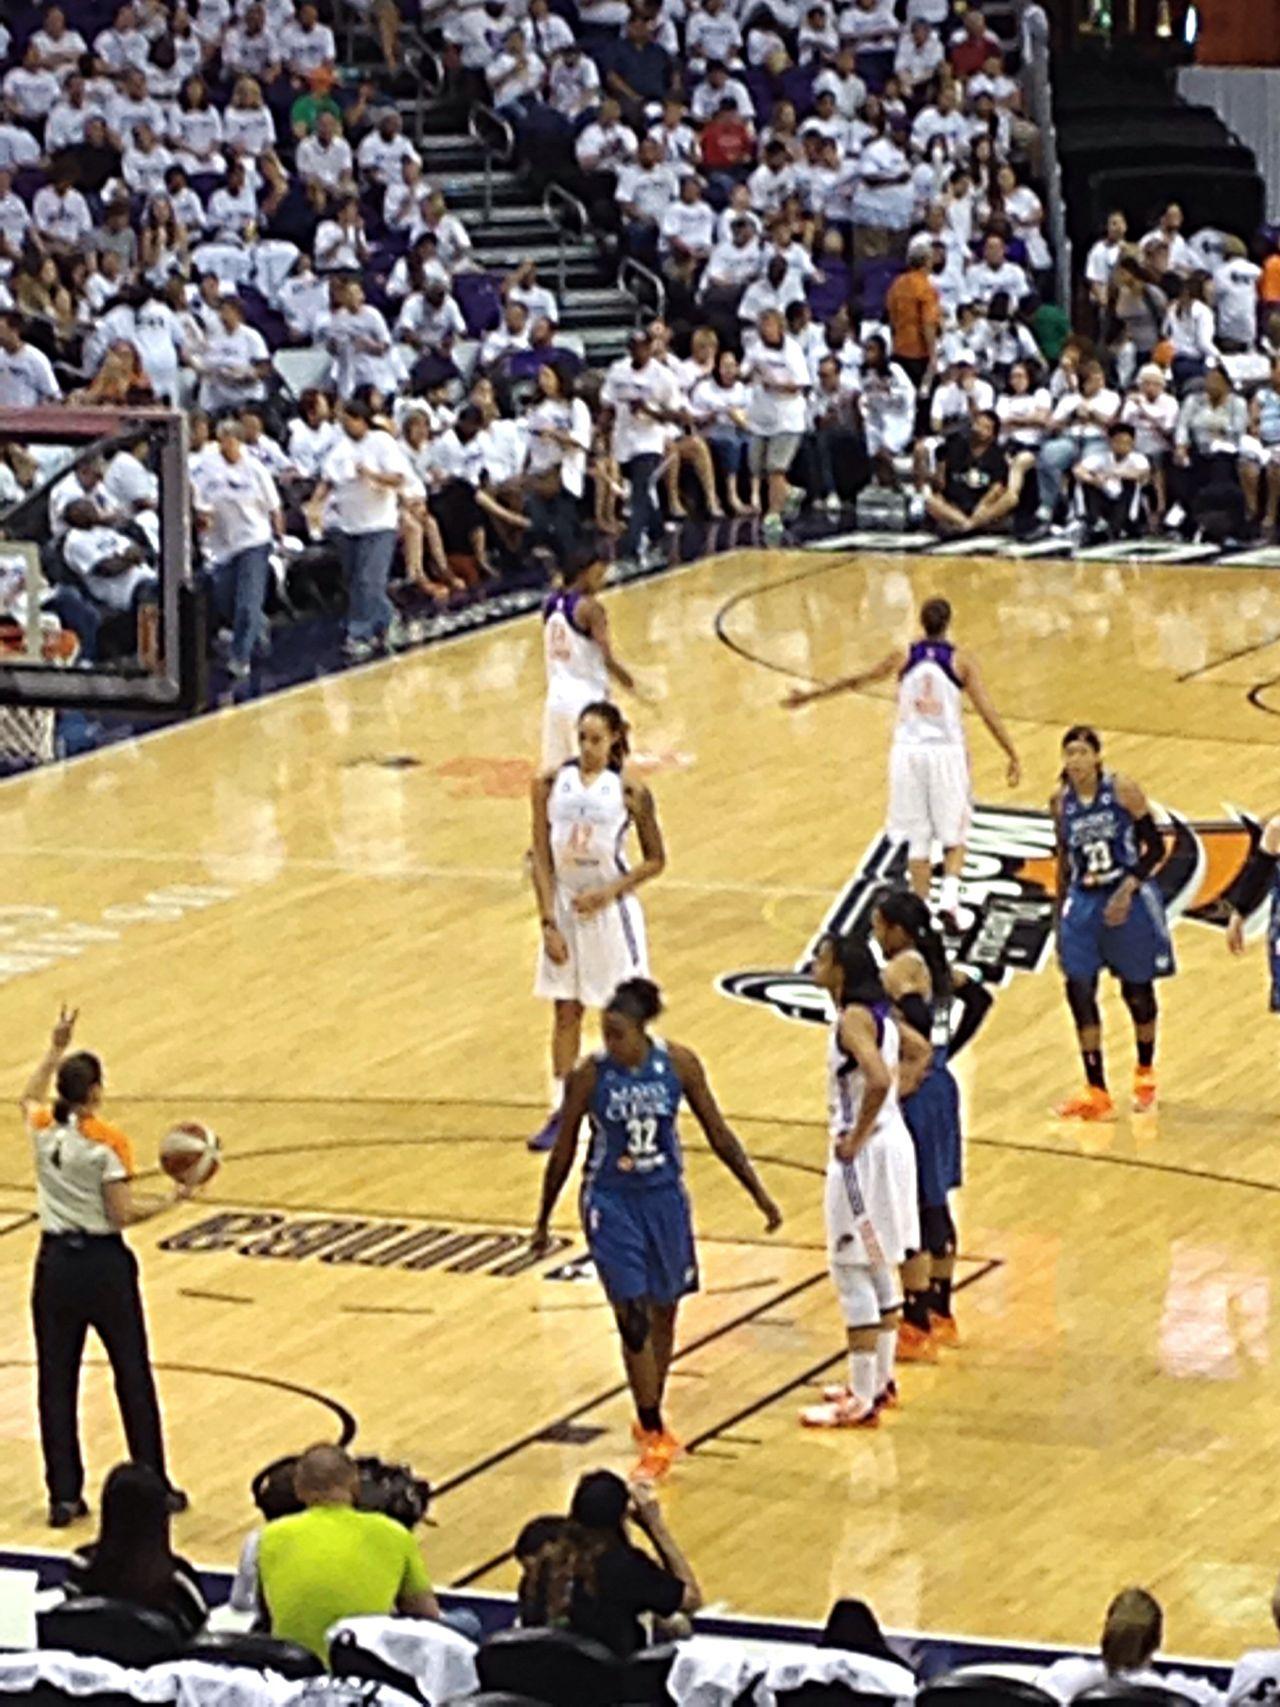 Brittany shooting free throws Basketball Wnba Playoffs Sports